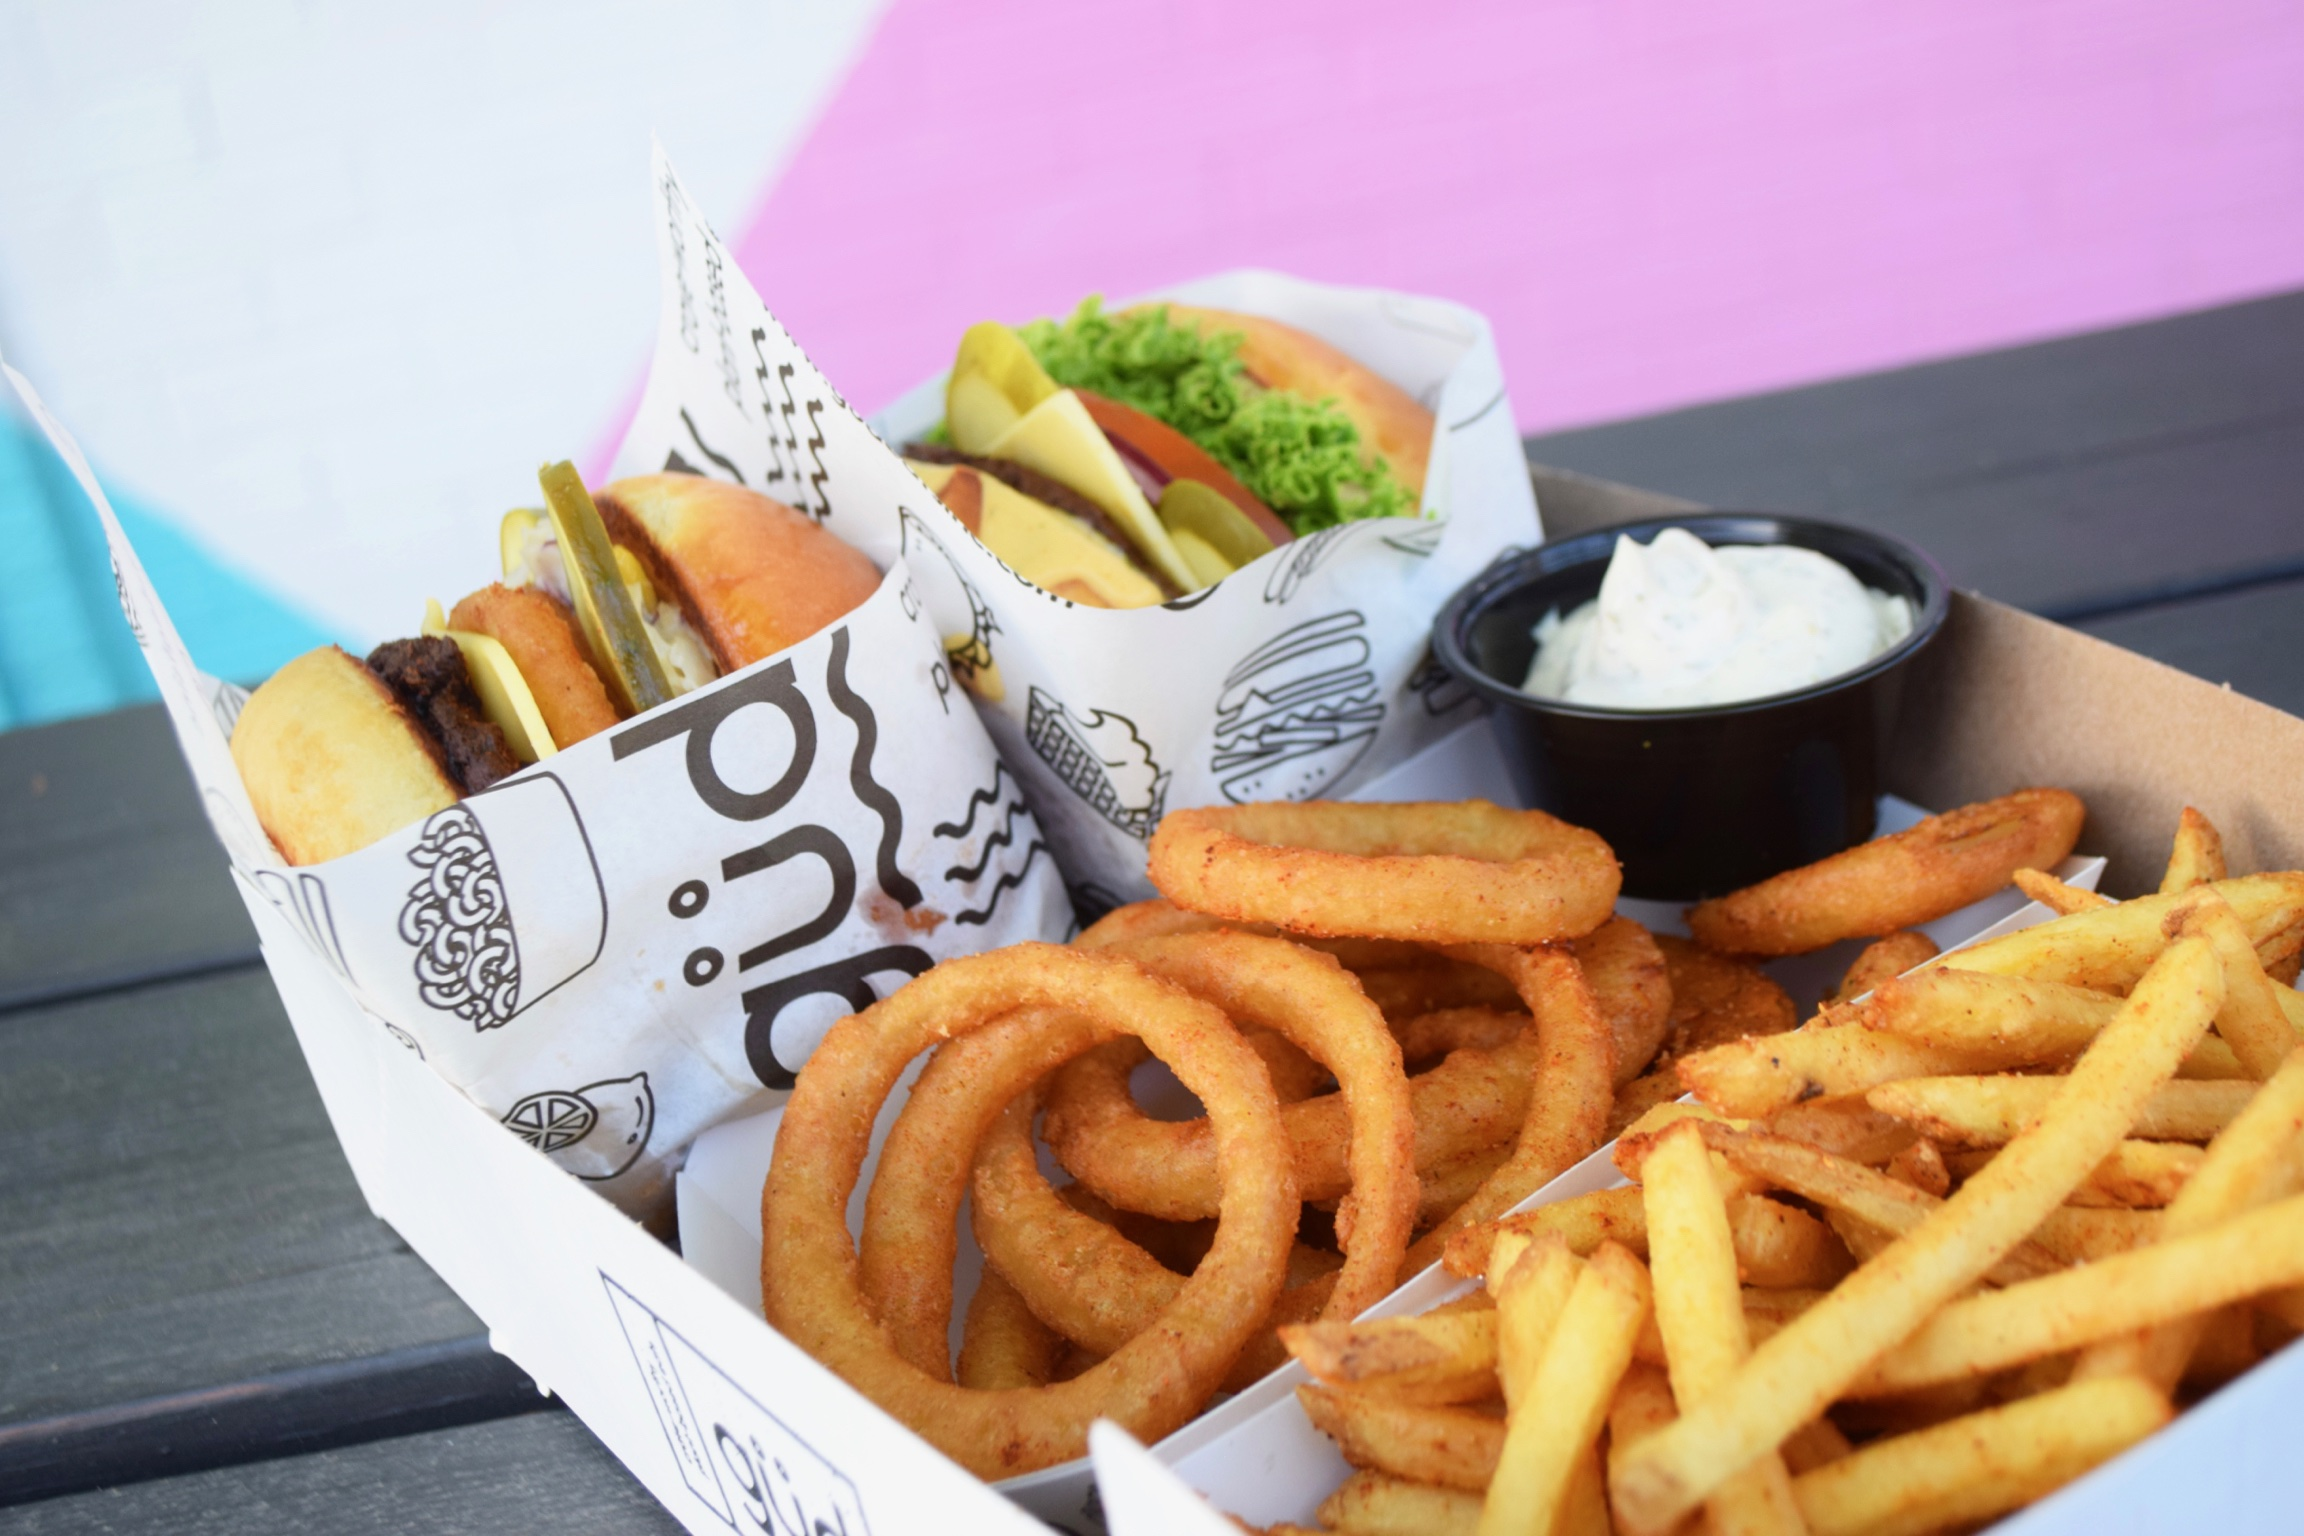 What's in the tastiest vegan food around? All kinds of güd stuff!